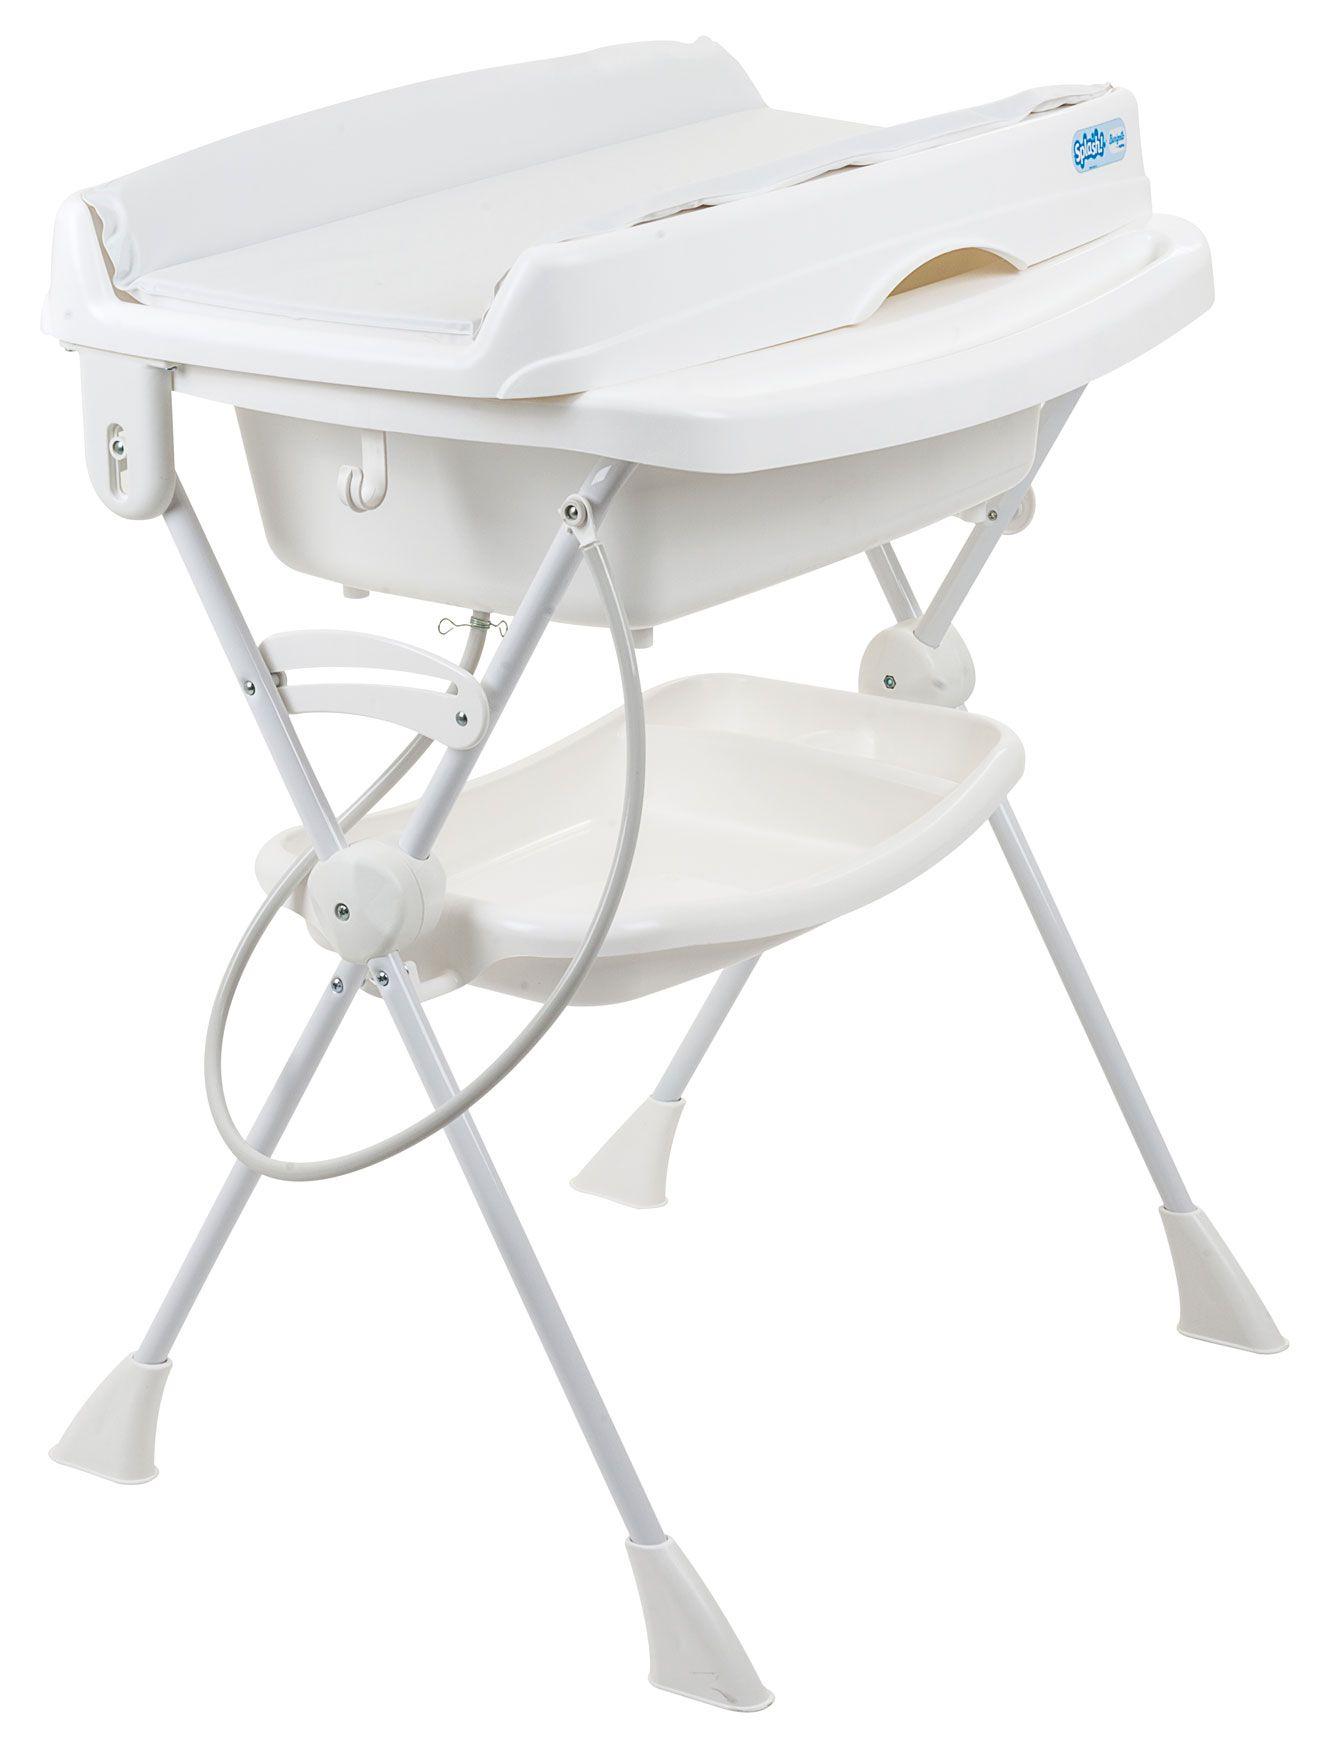 Banheira Splash Branco - Burigotto Ref 3043